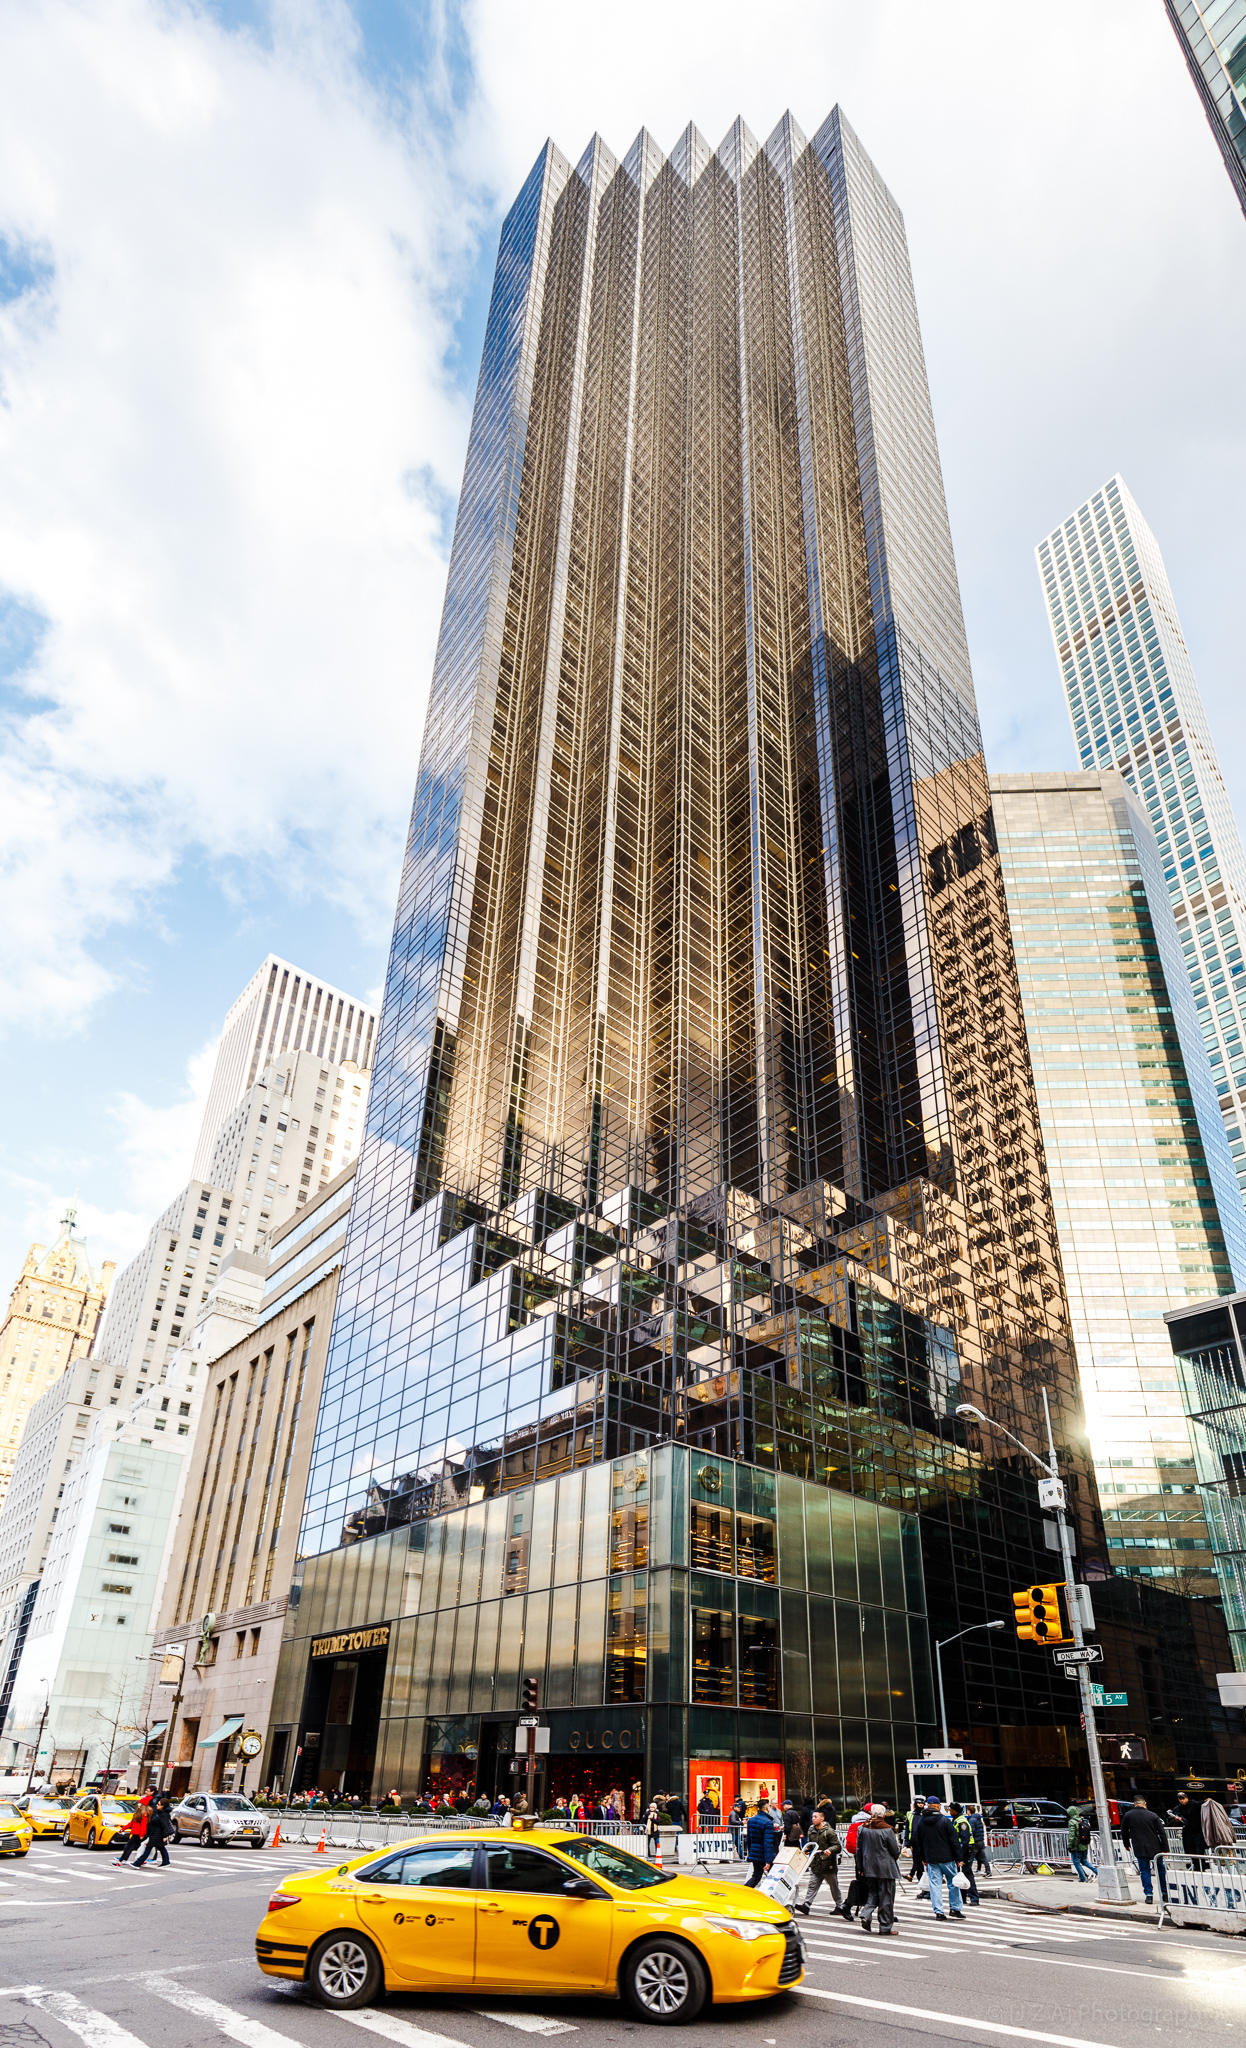 2017, New York